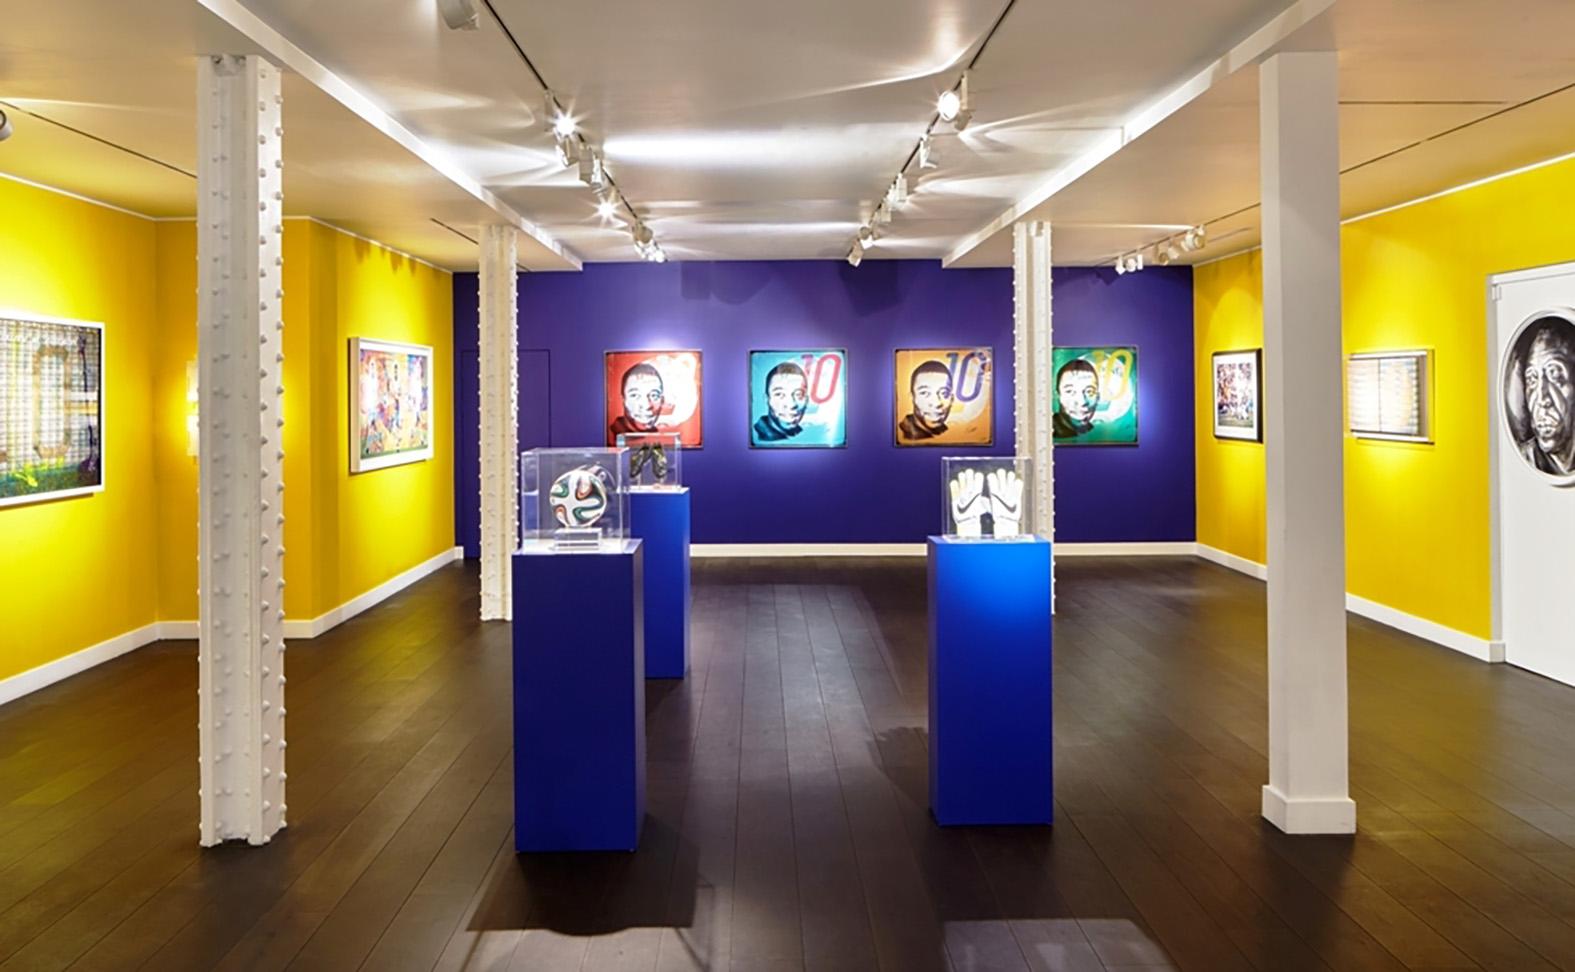 Louis Sidoli Neon Art: Pele Art Life Football - Halyon Gallery - 15